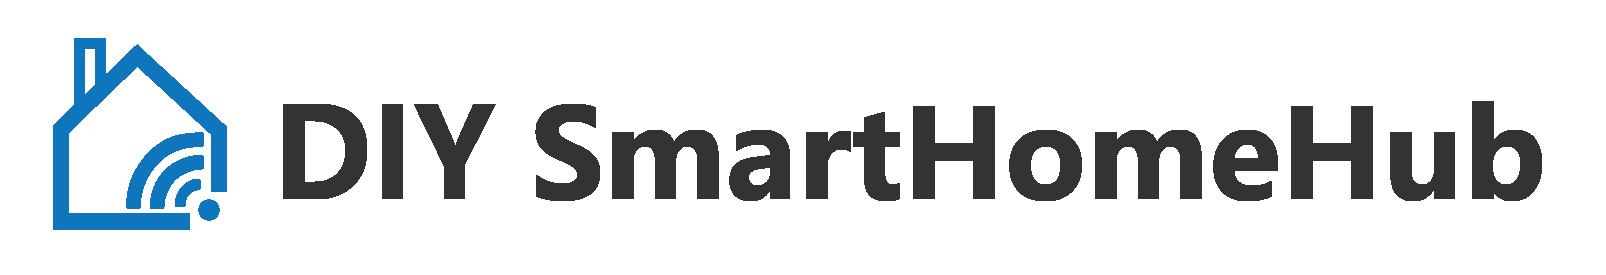 DIY Smart Home Hub